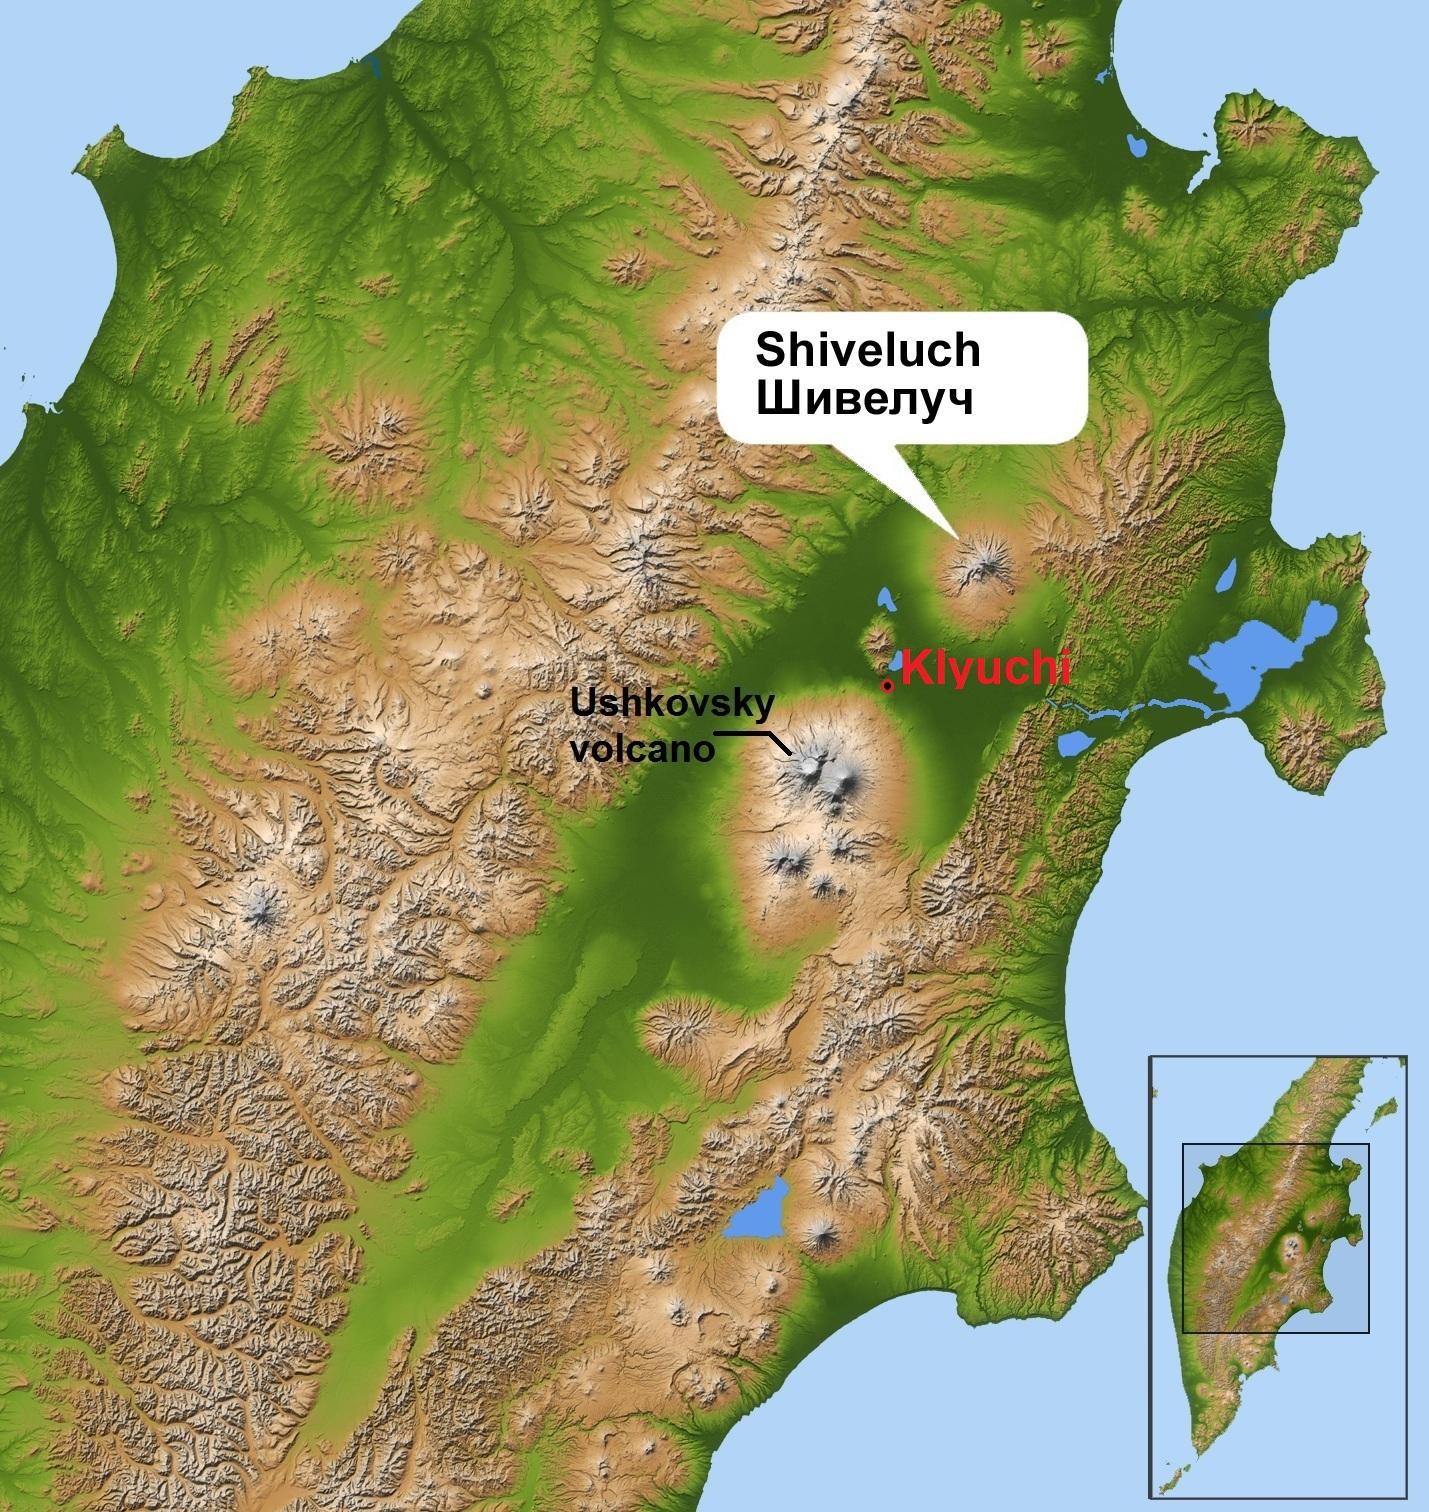 Kamchatka Peninsula On World Map.File Shiveluch Volcano And Klyuchi On Kamchatka Peninsula Jpg